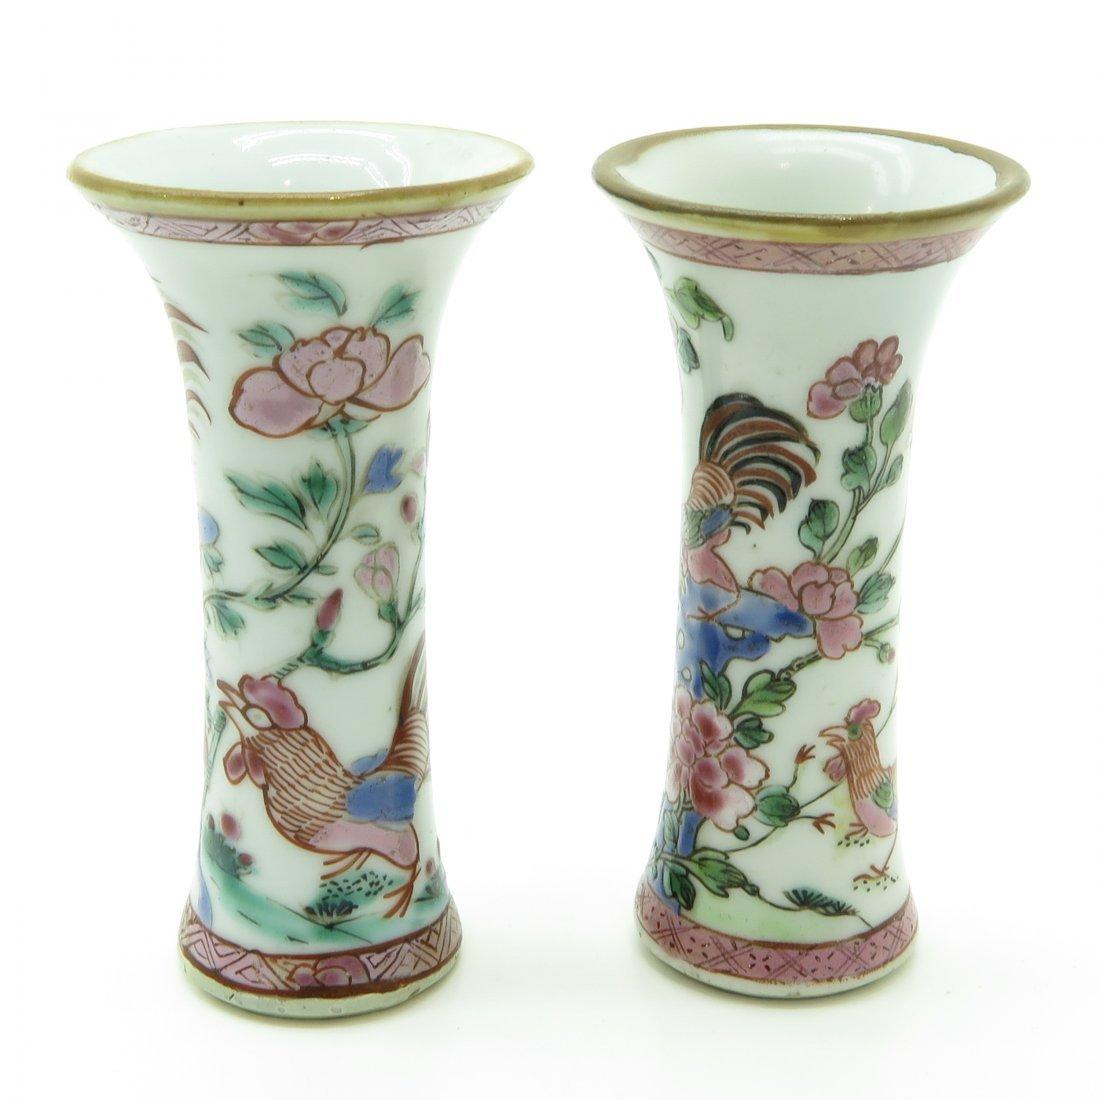 Lot of 2 China Porcelain Miniature Vases